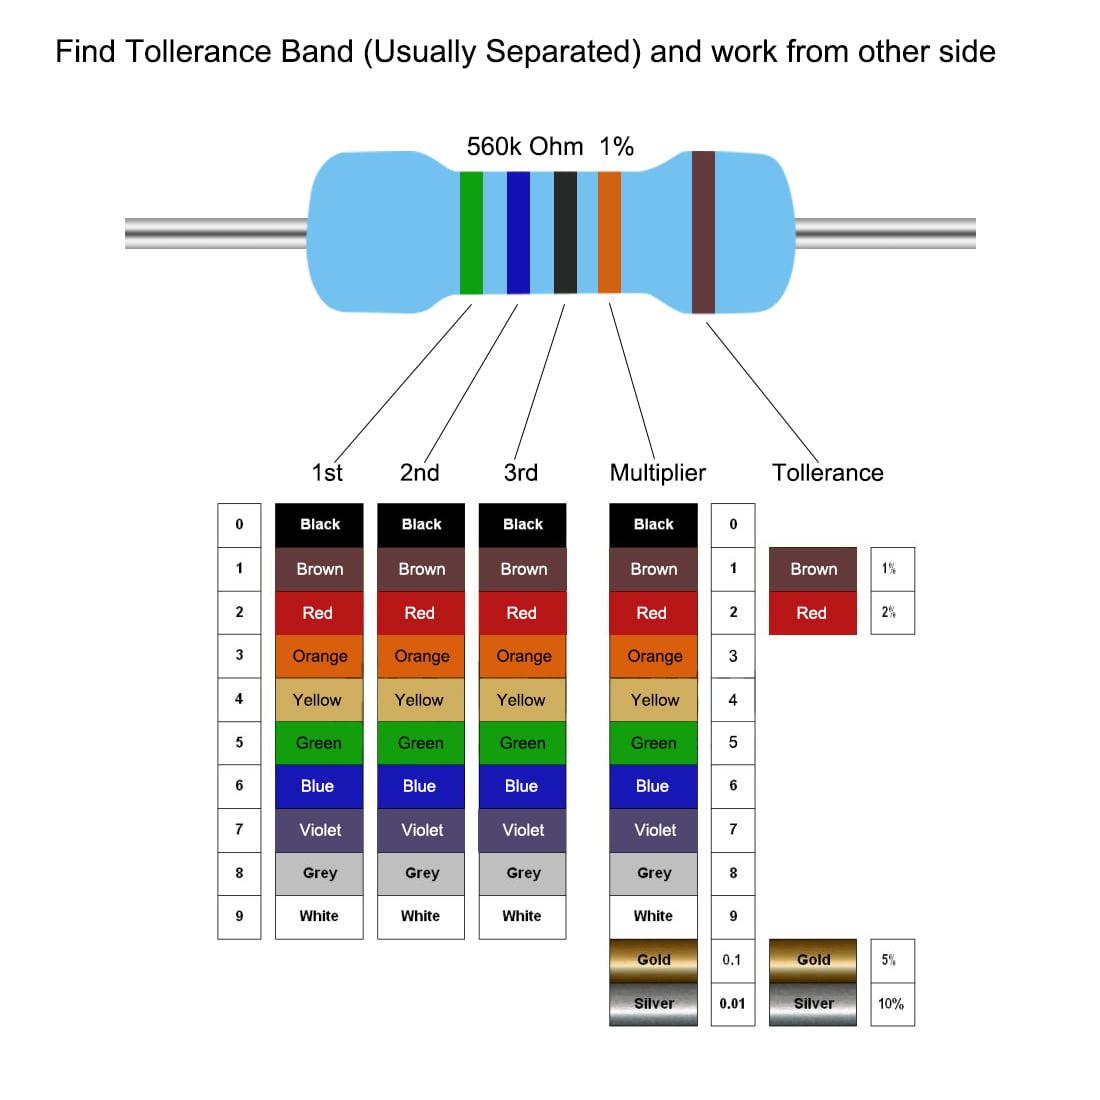 Metal Film Resistors 300k Ohm 1W 1% Tolerances 5 Color Bands Pack of 200 - image 3 of 4